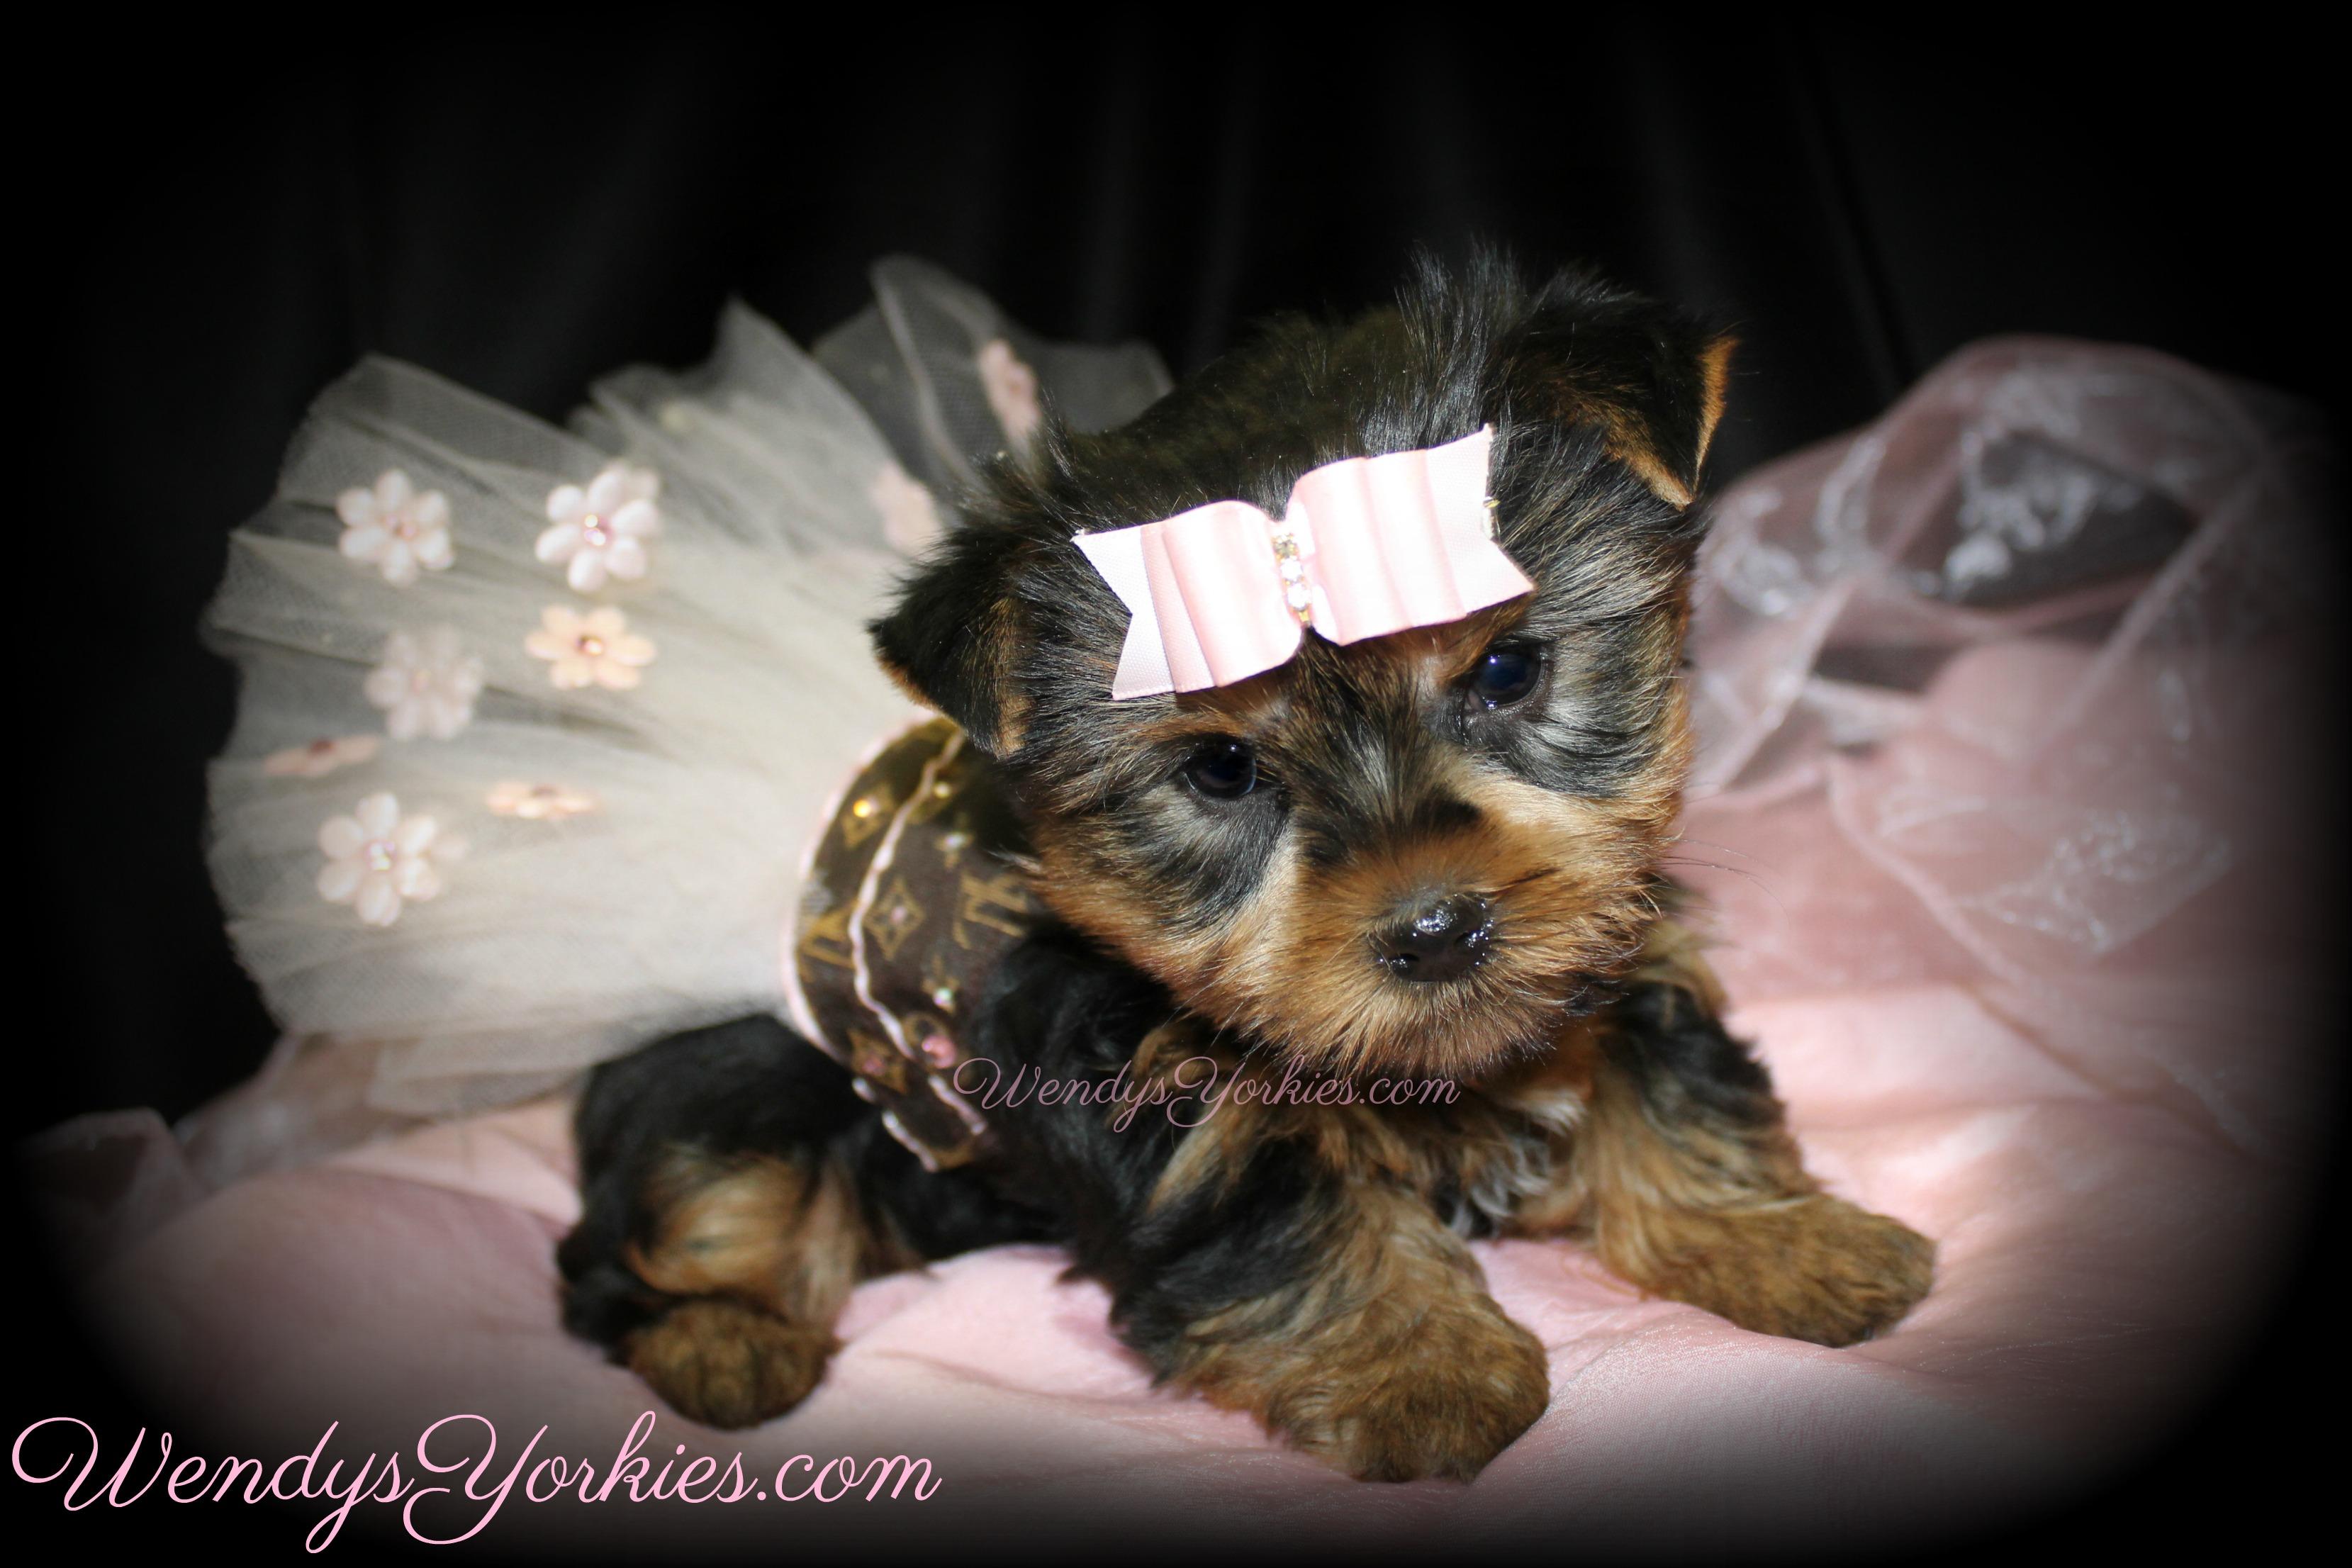 Cute Teacup Yorkie puppy for slae, WendysYorkies.com, Star f1